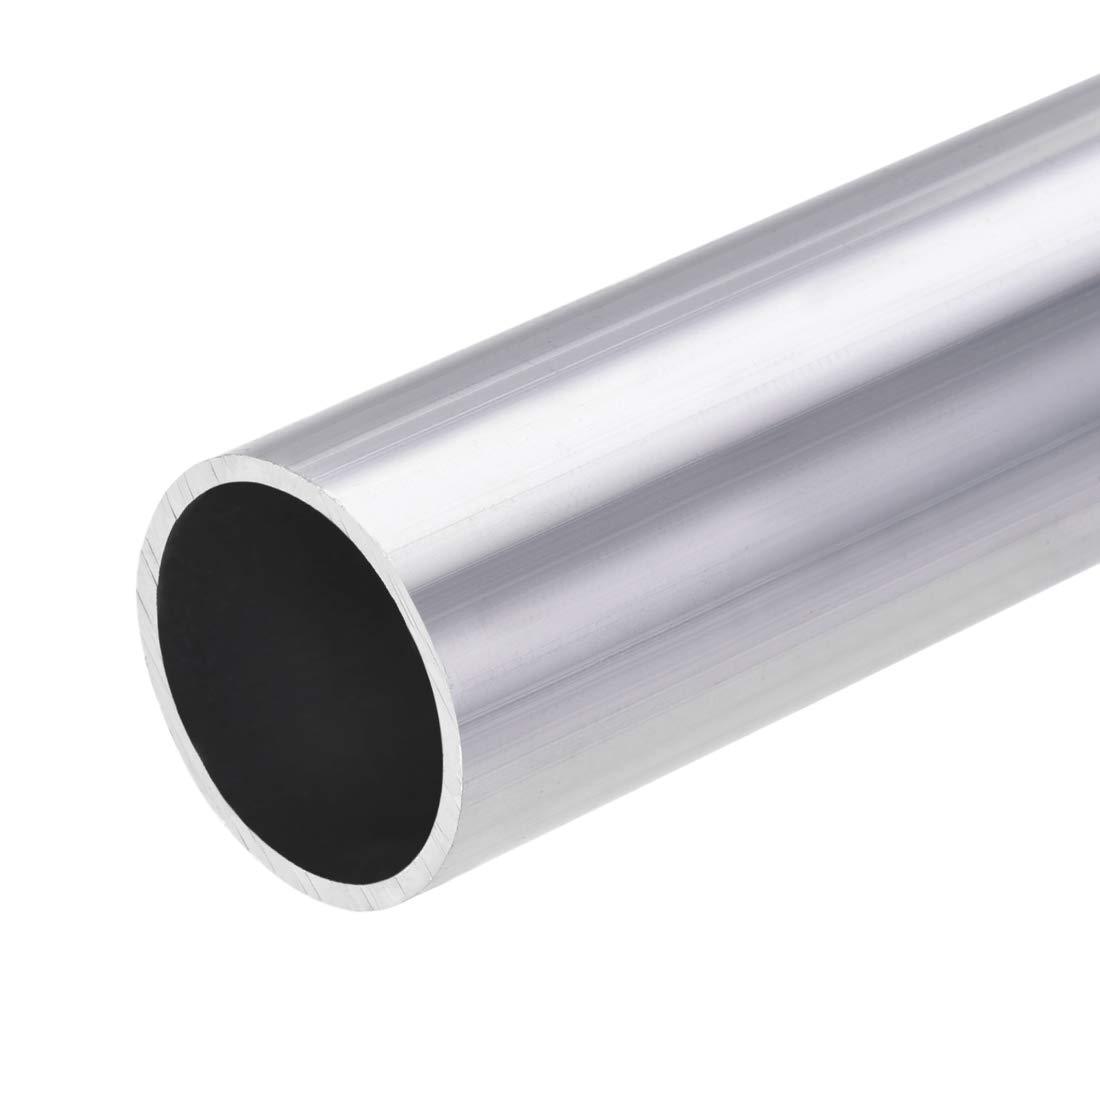 28mm OD 25mm Inner Dia 300mm Length Seamless Straight Tubing 3 Pcs uxcell 6063 Aluminum Round Tube